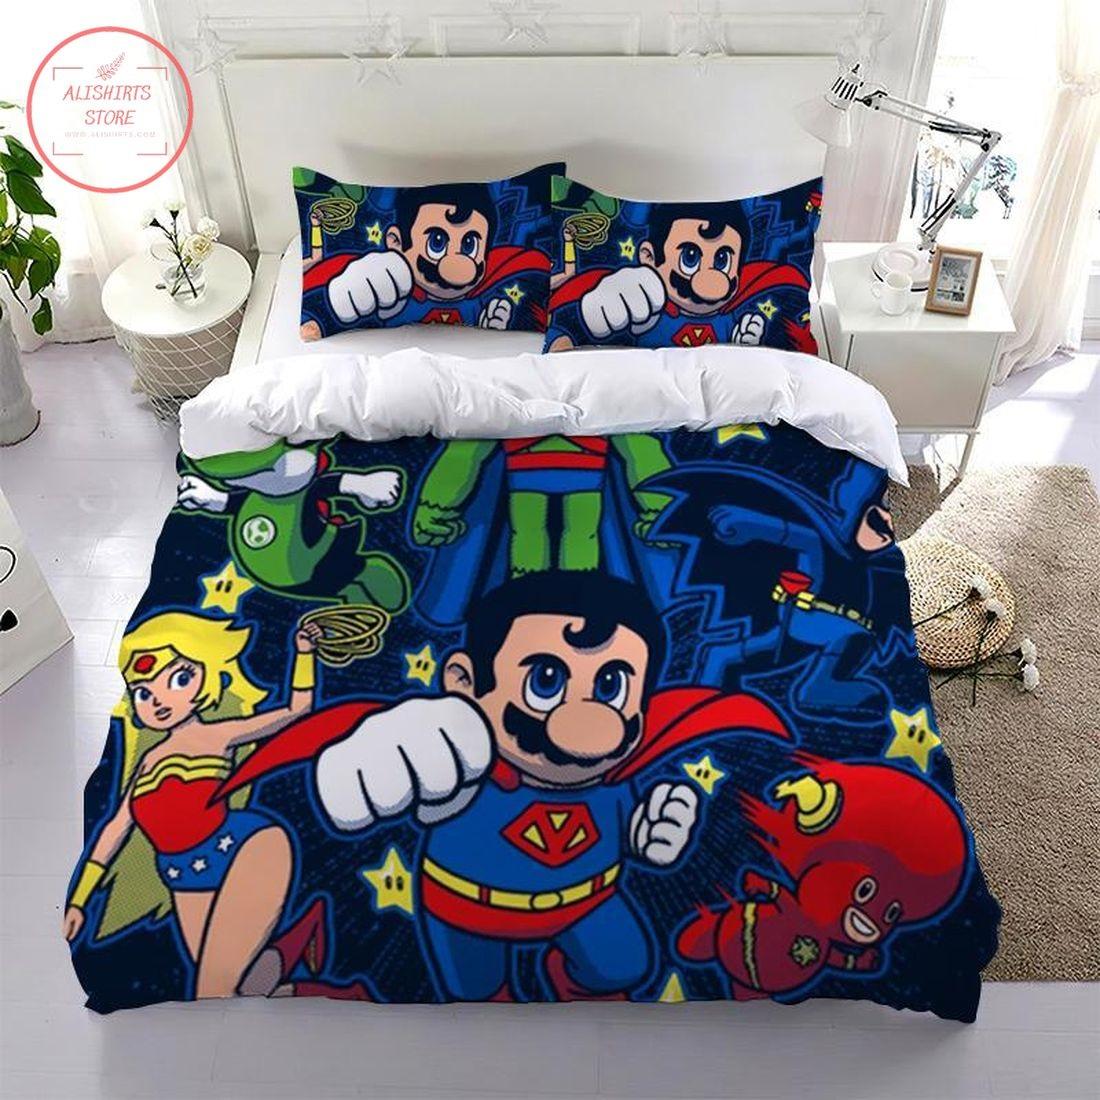 Super Mario All Superman Bedding Set